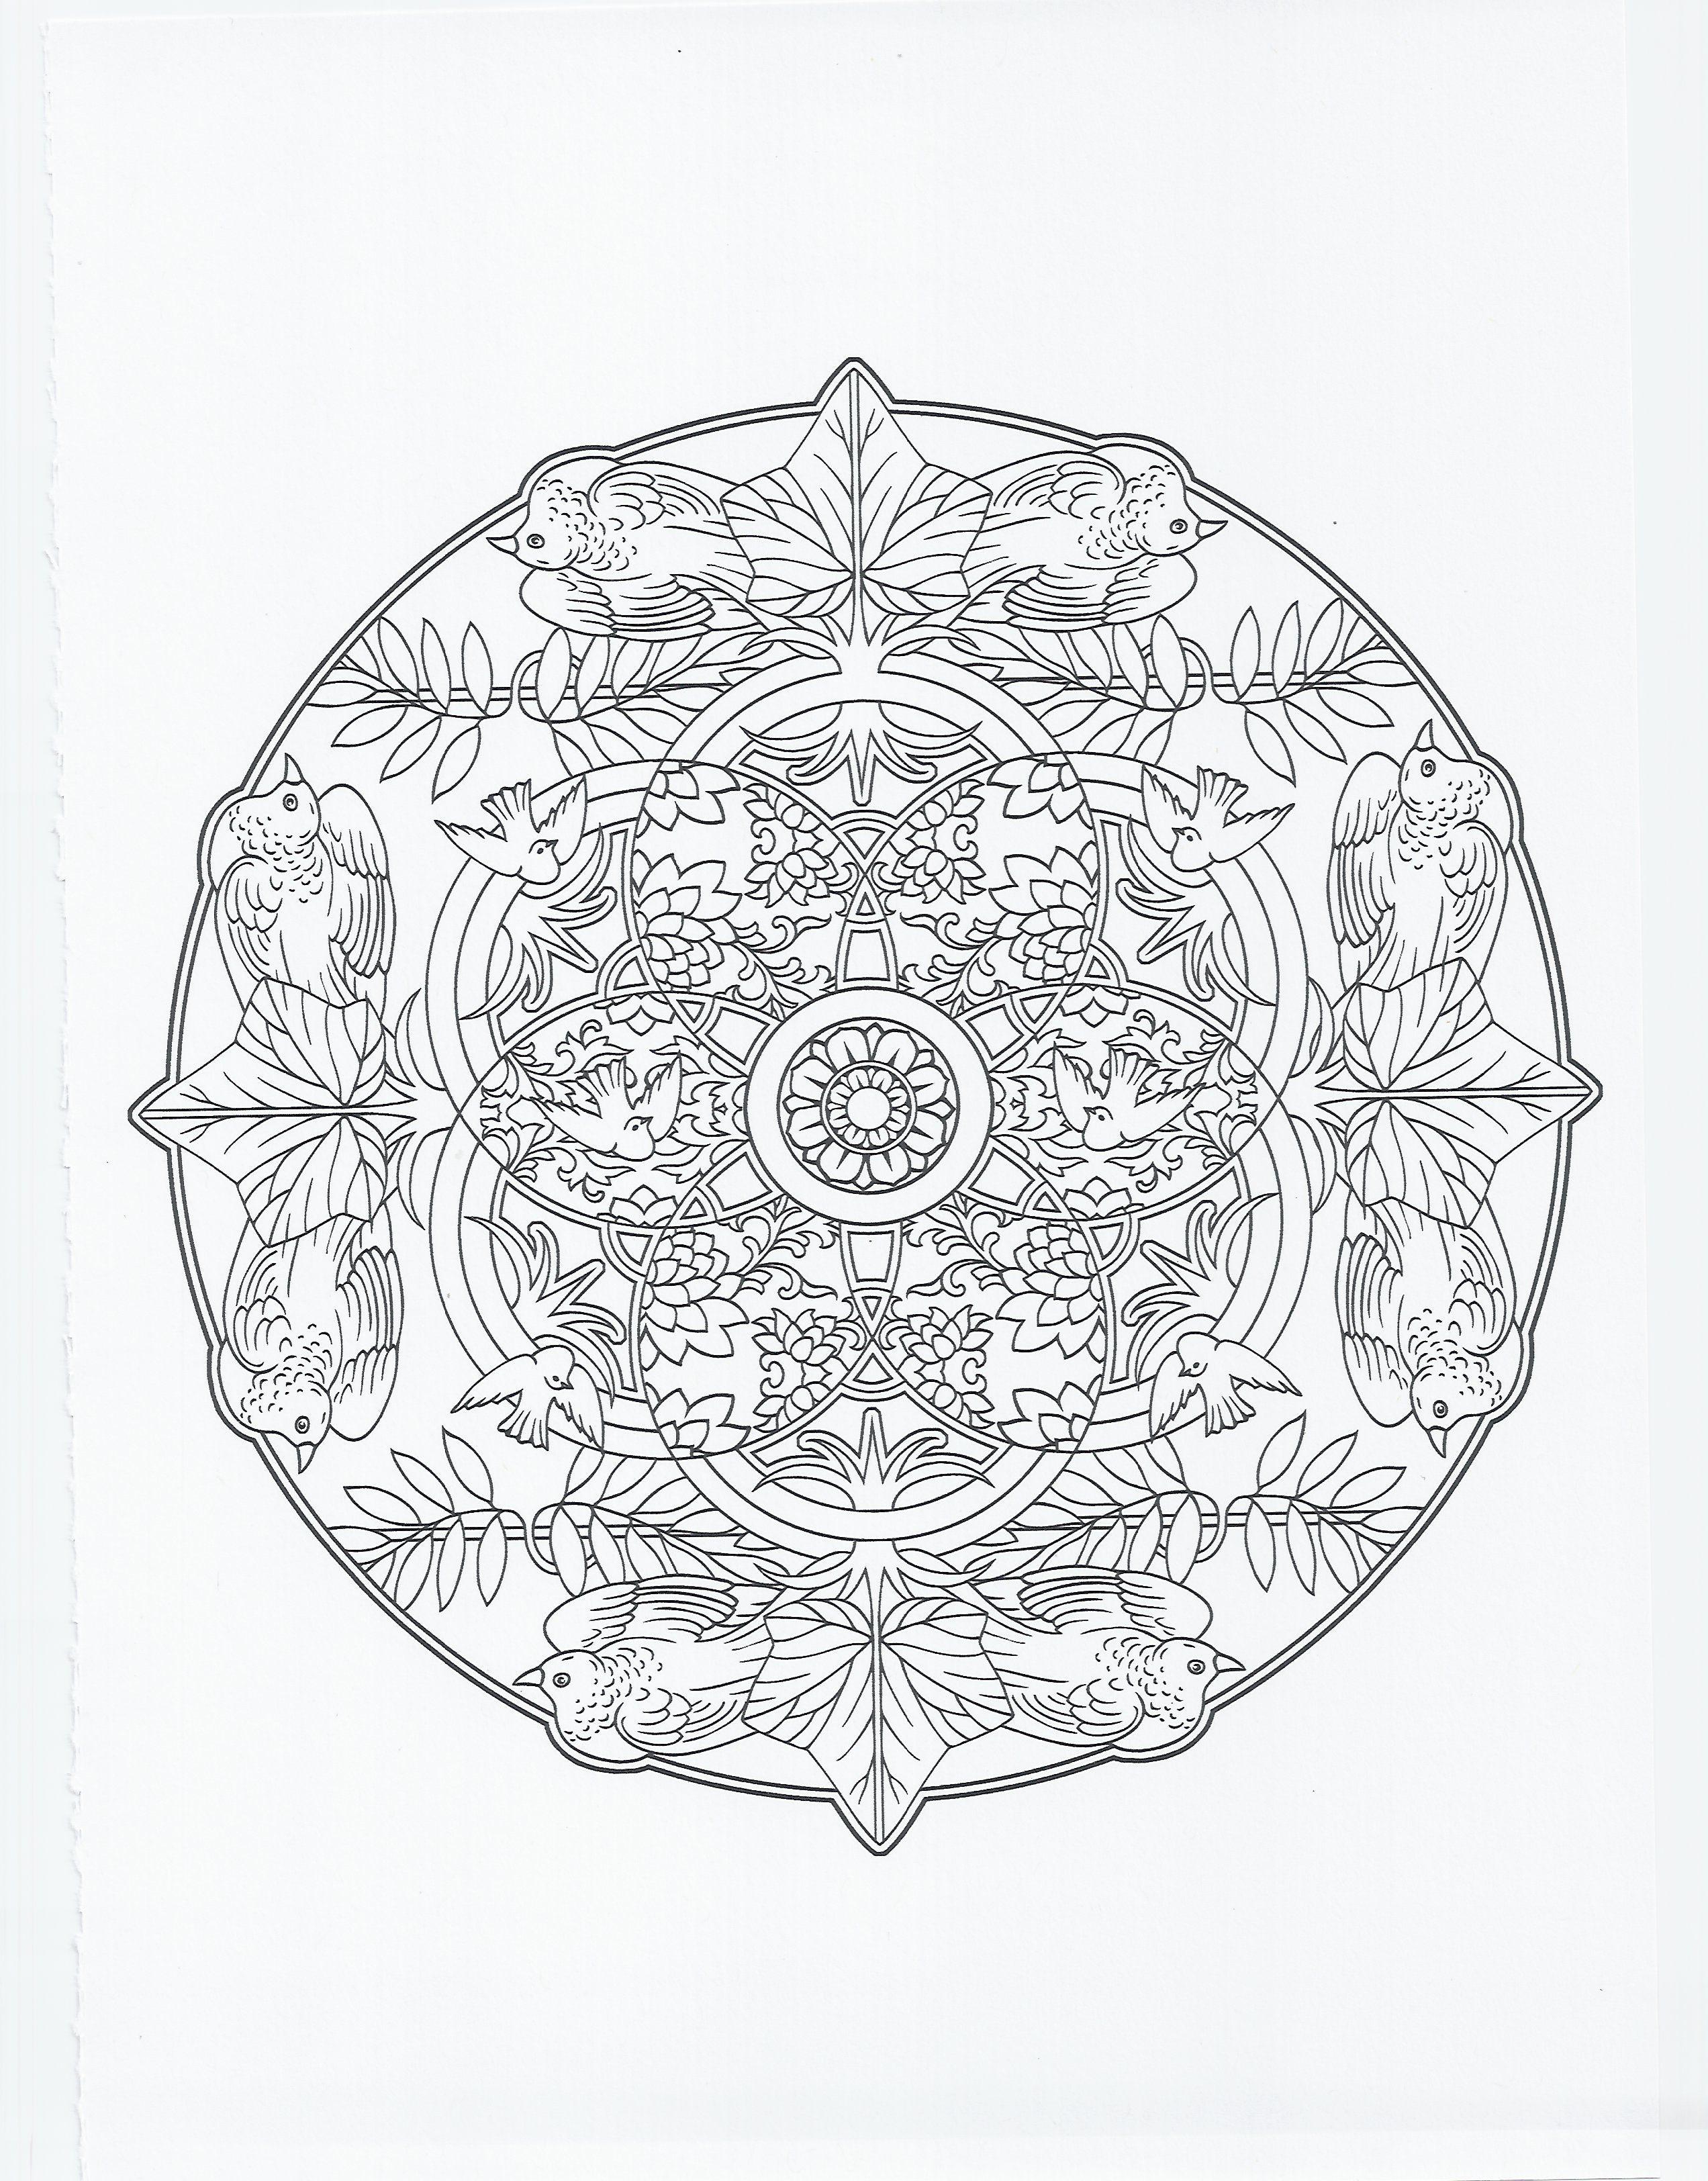 Ausmalbilder Mandala Herzen Inspirierend 32 Fisch Ausmalbilder Zum Ausdrucken Scoredatscore Inspirierend Stock